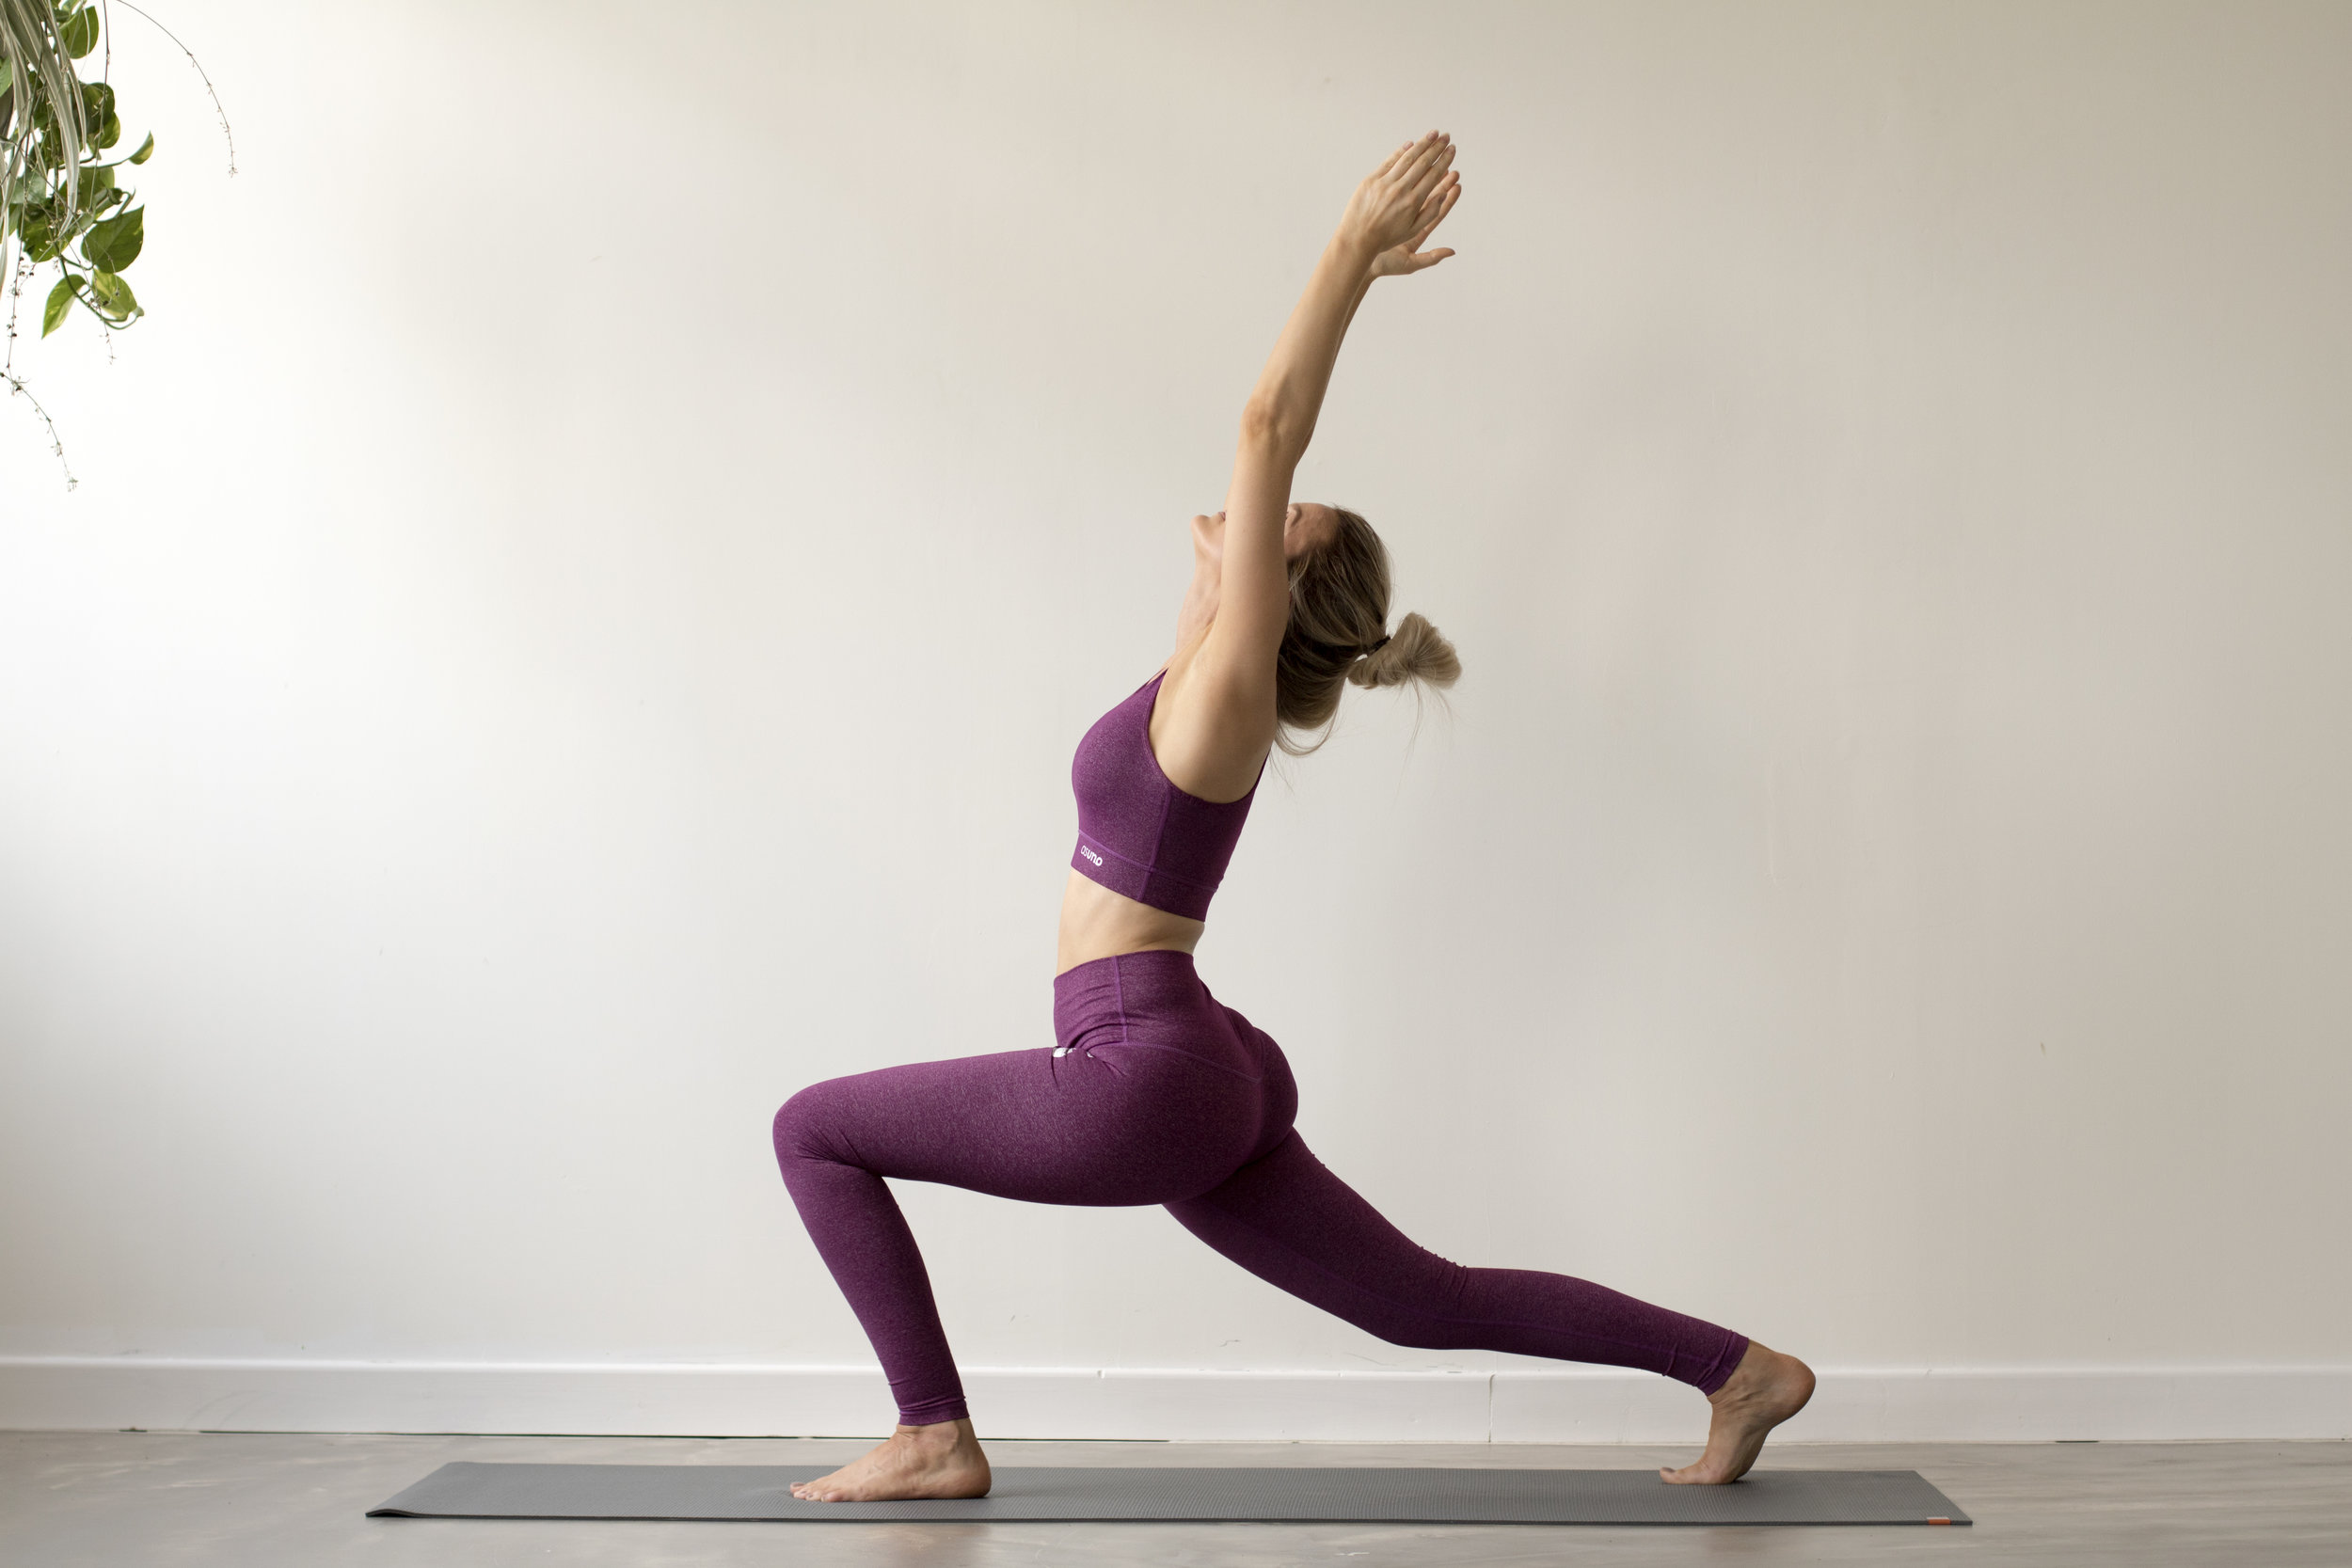 Asuno Athletica ethical yoga fitness clothing 7136.jpg